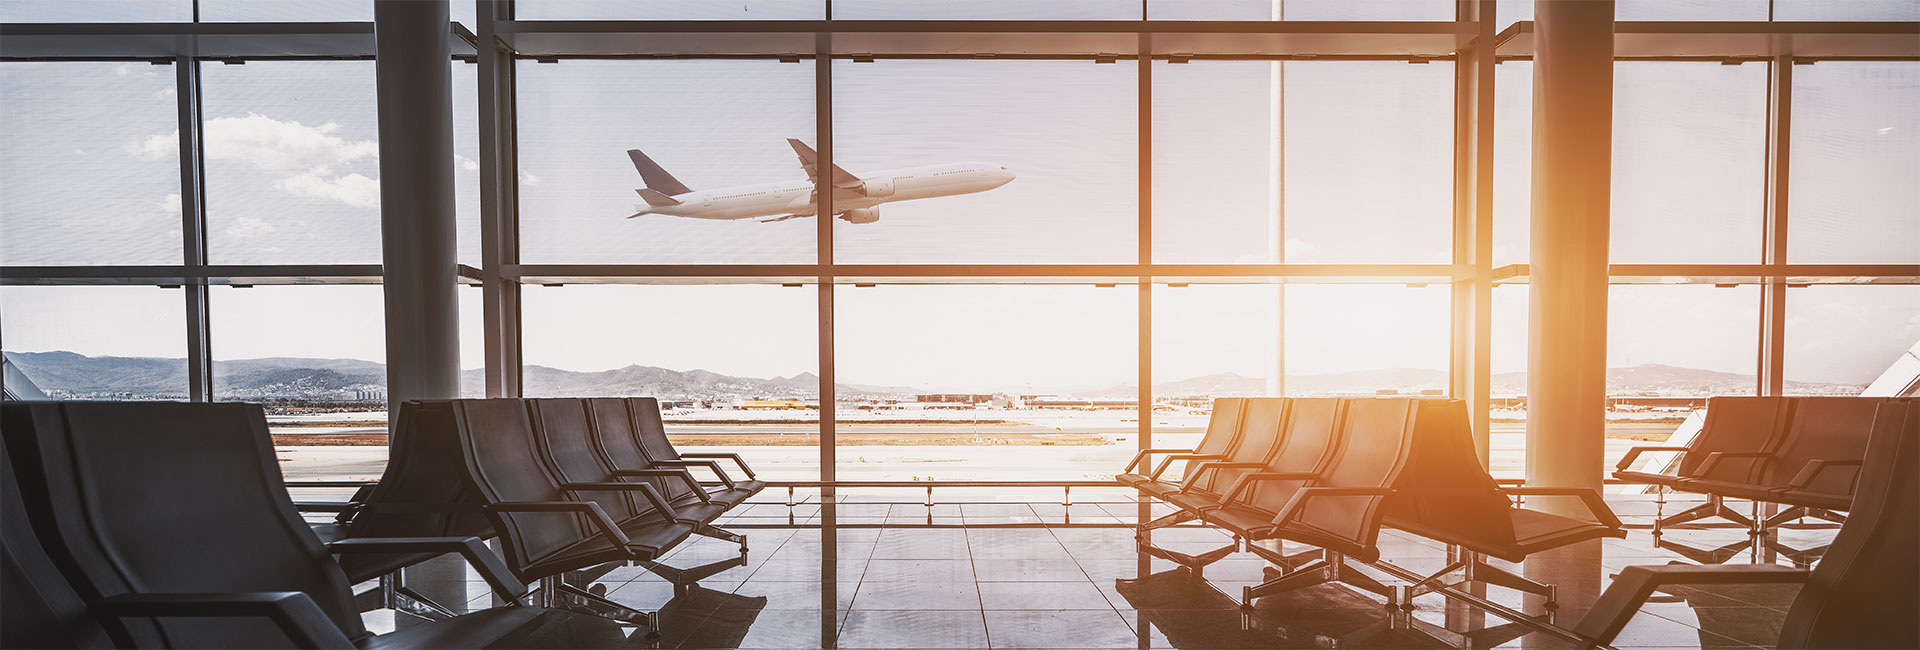 Puerto Vallarta Airport Receives Aci Health Accreditation